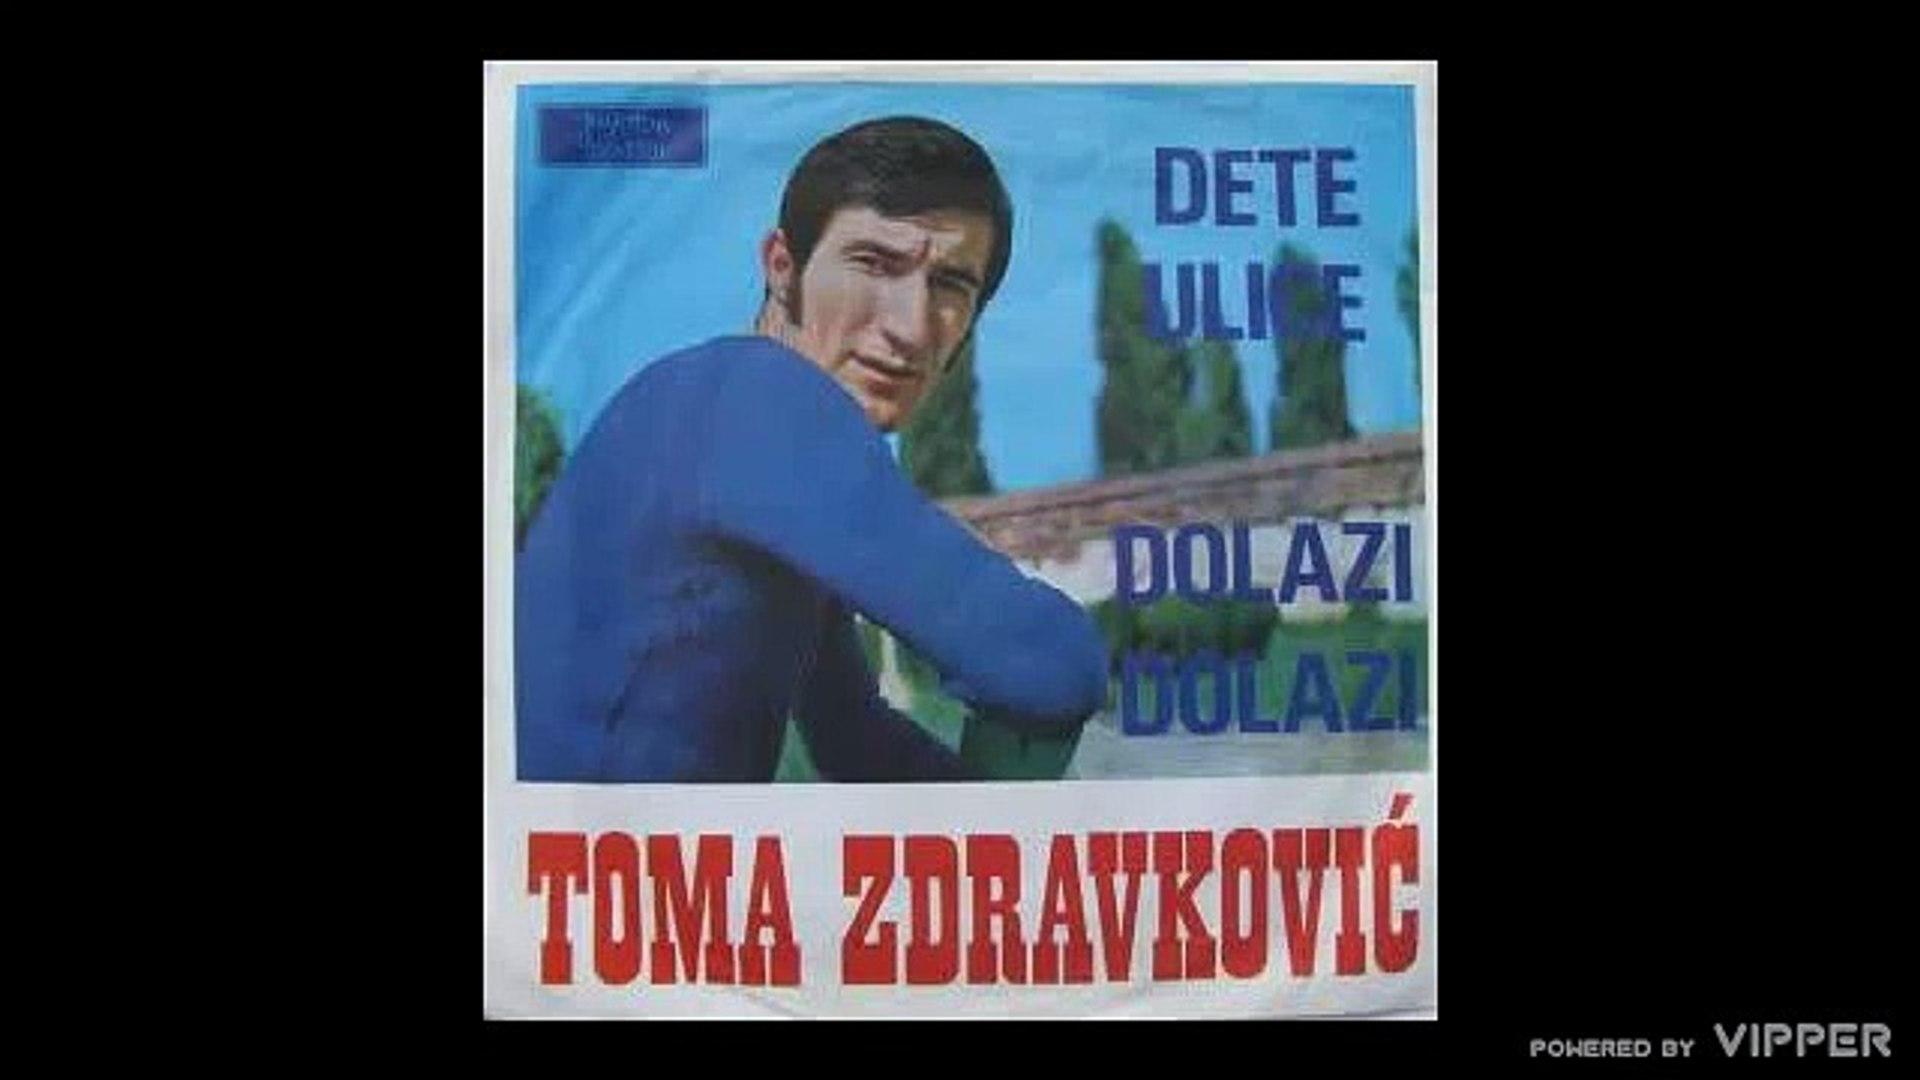 Toma Zdravkovic - Dete ulice - (audio) - 1970 Jugoton